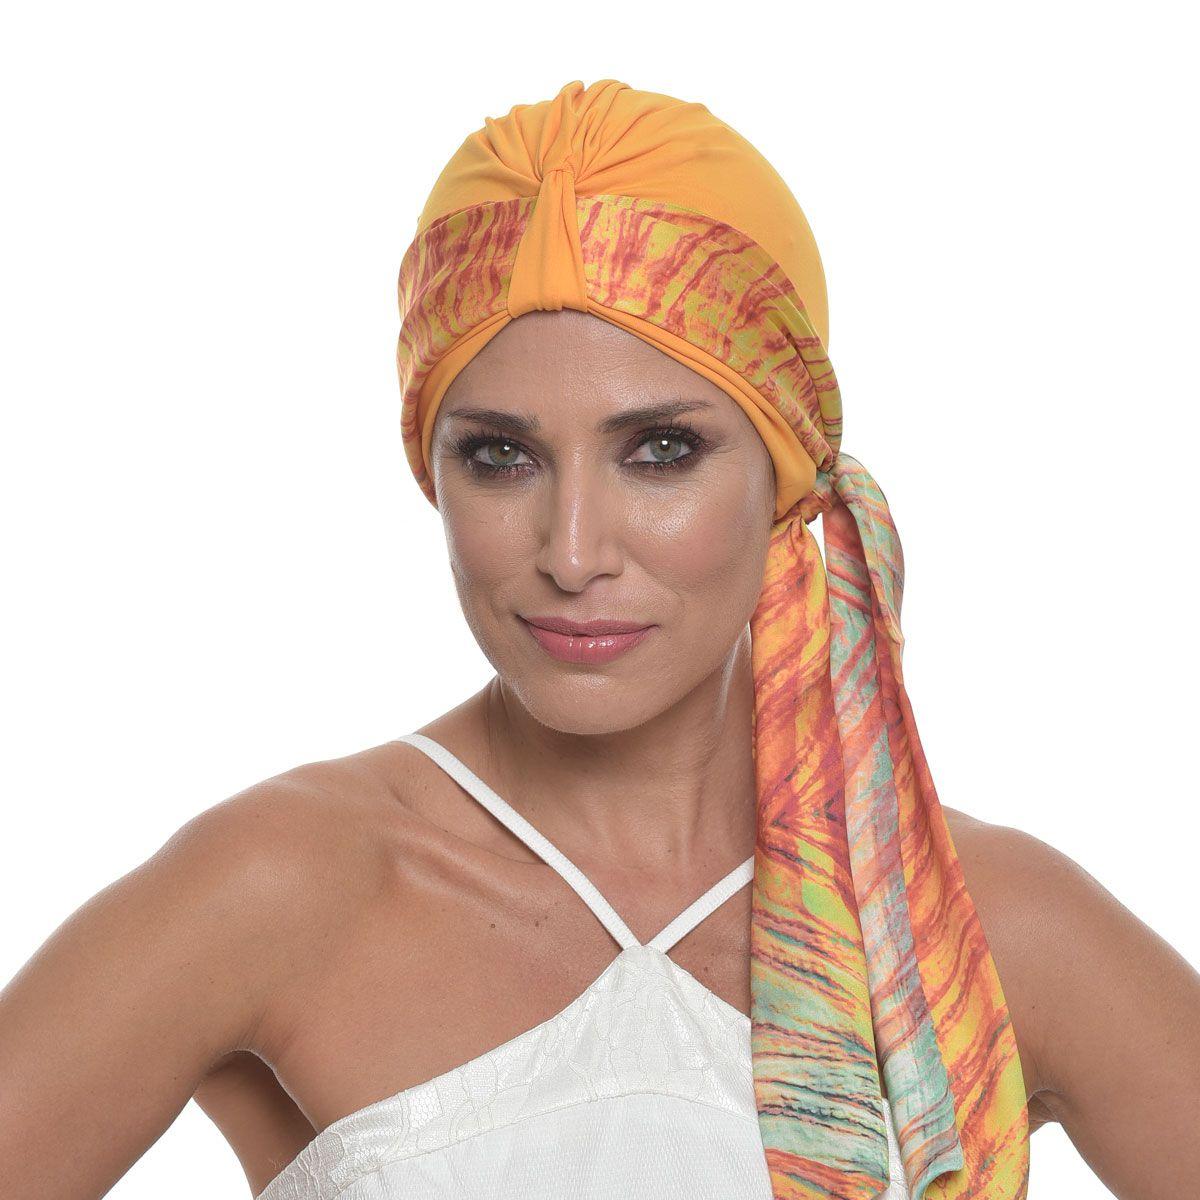 Faixa Lille 10X140  Estampa Nathalia  + Turbante Argola Amarelo